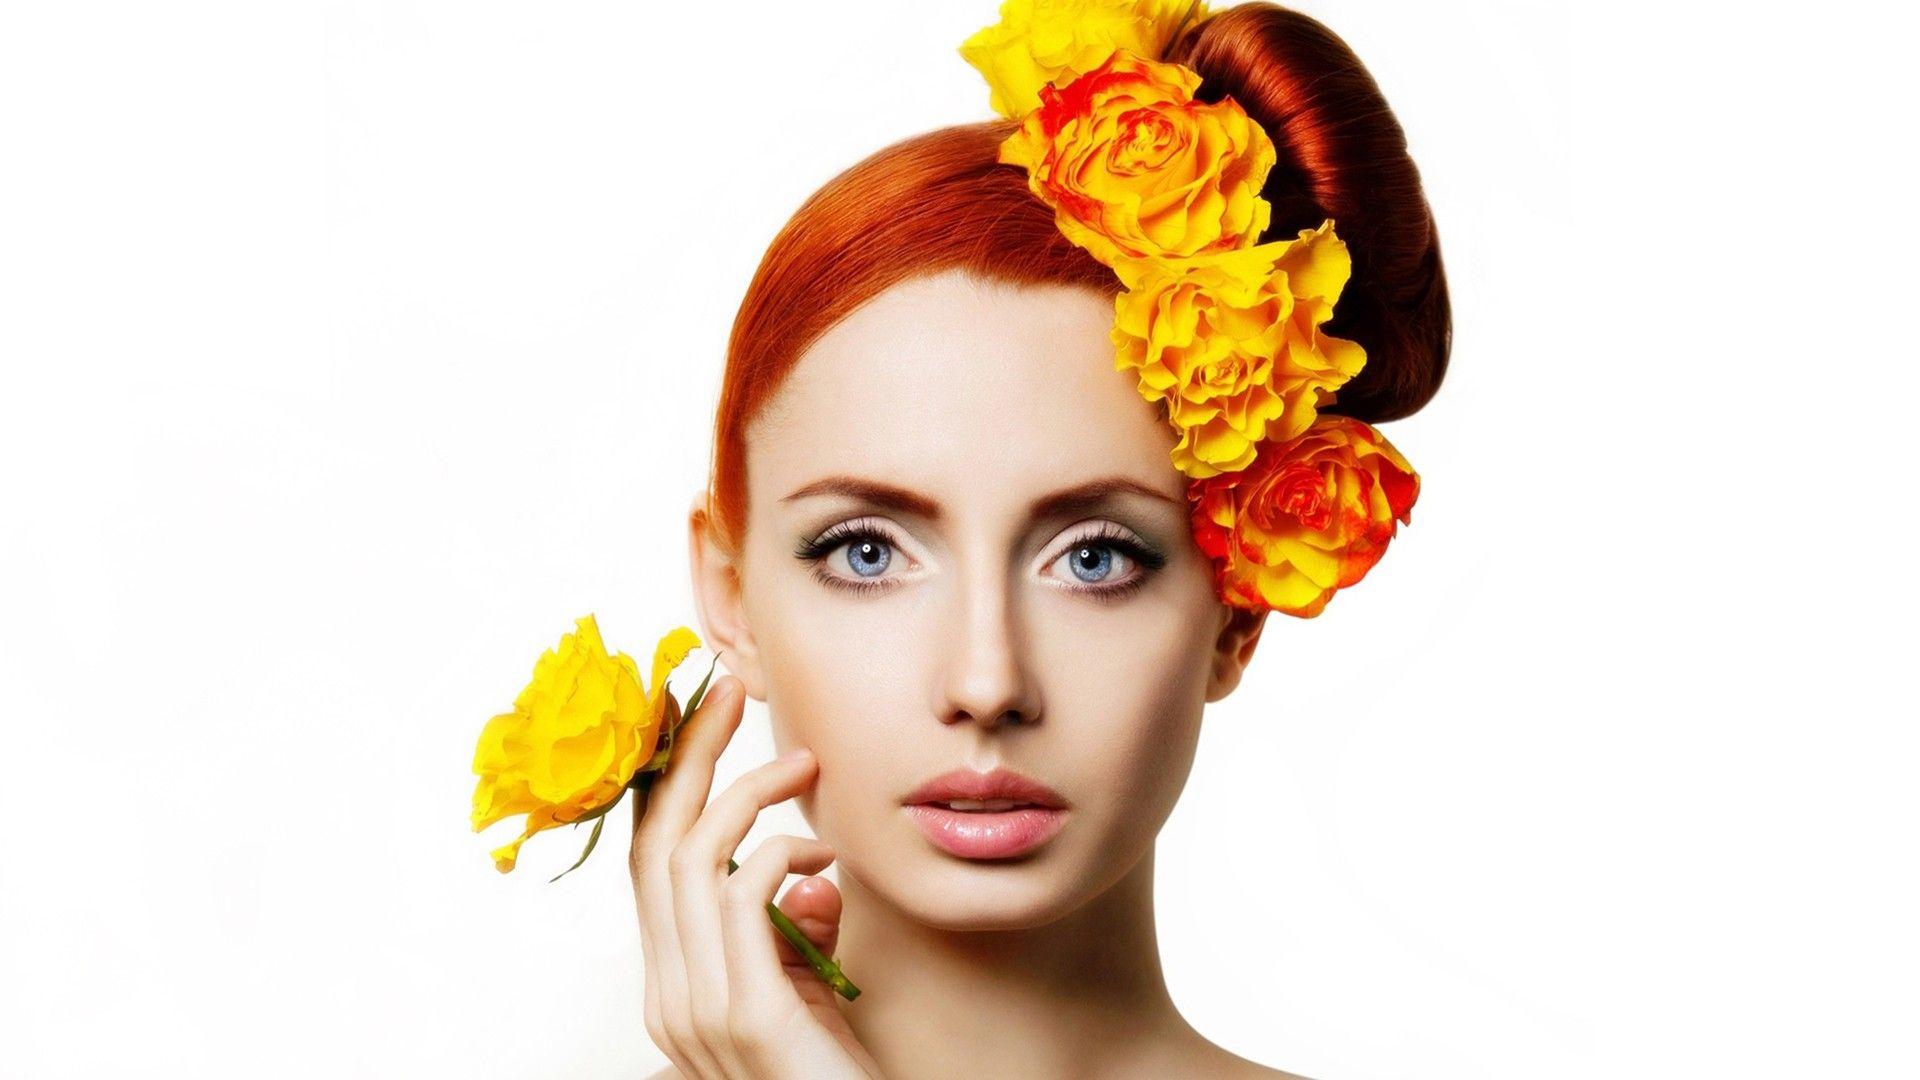 women closeup eyes flowers redheads models lips glamour